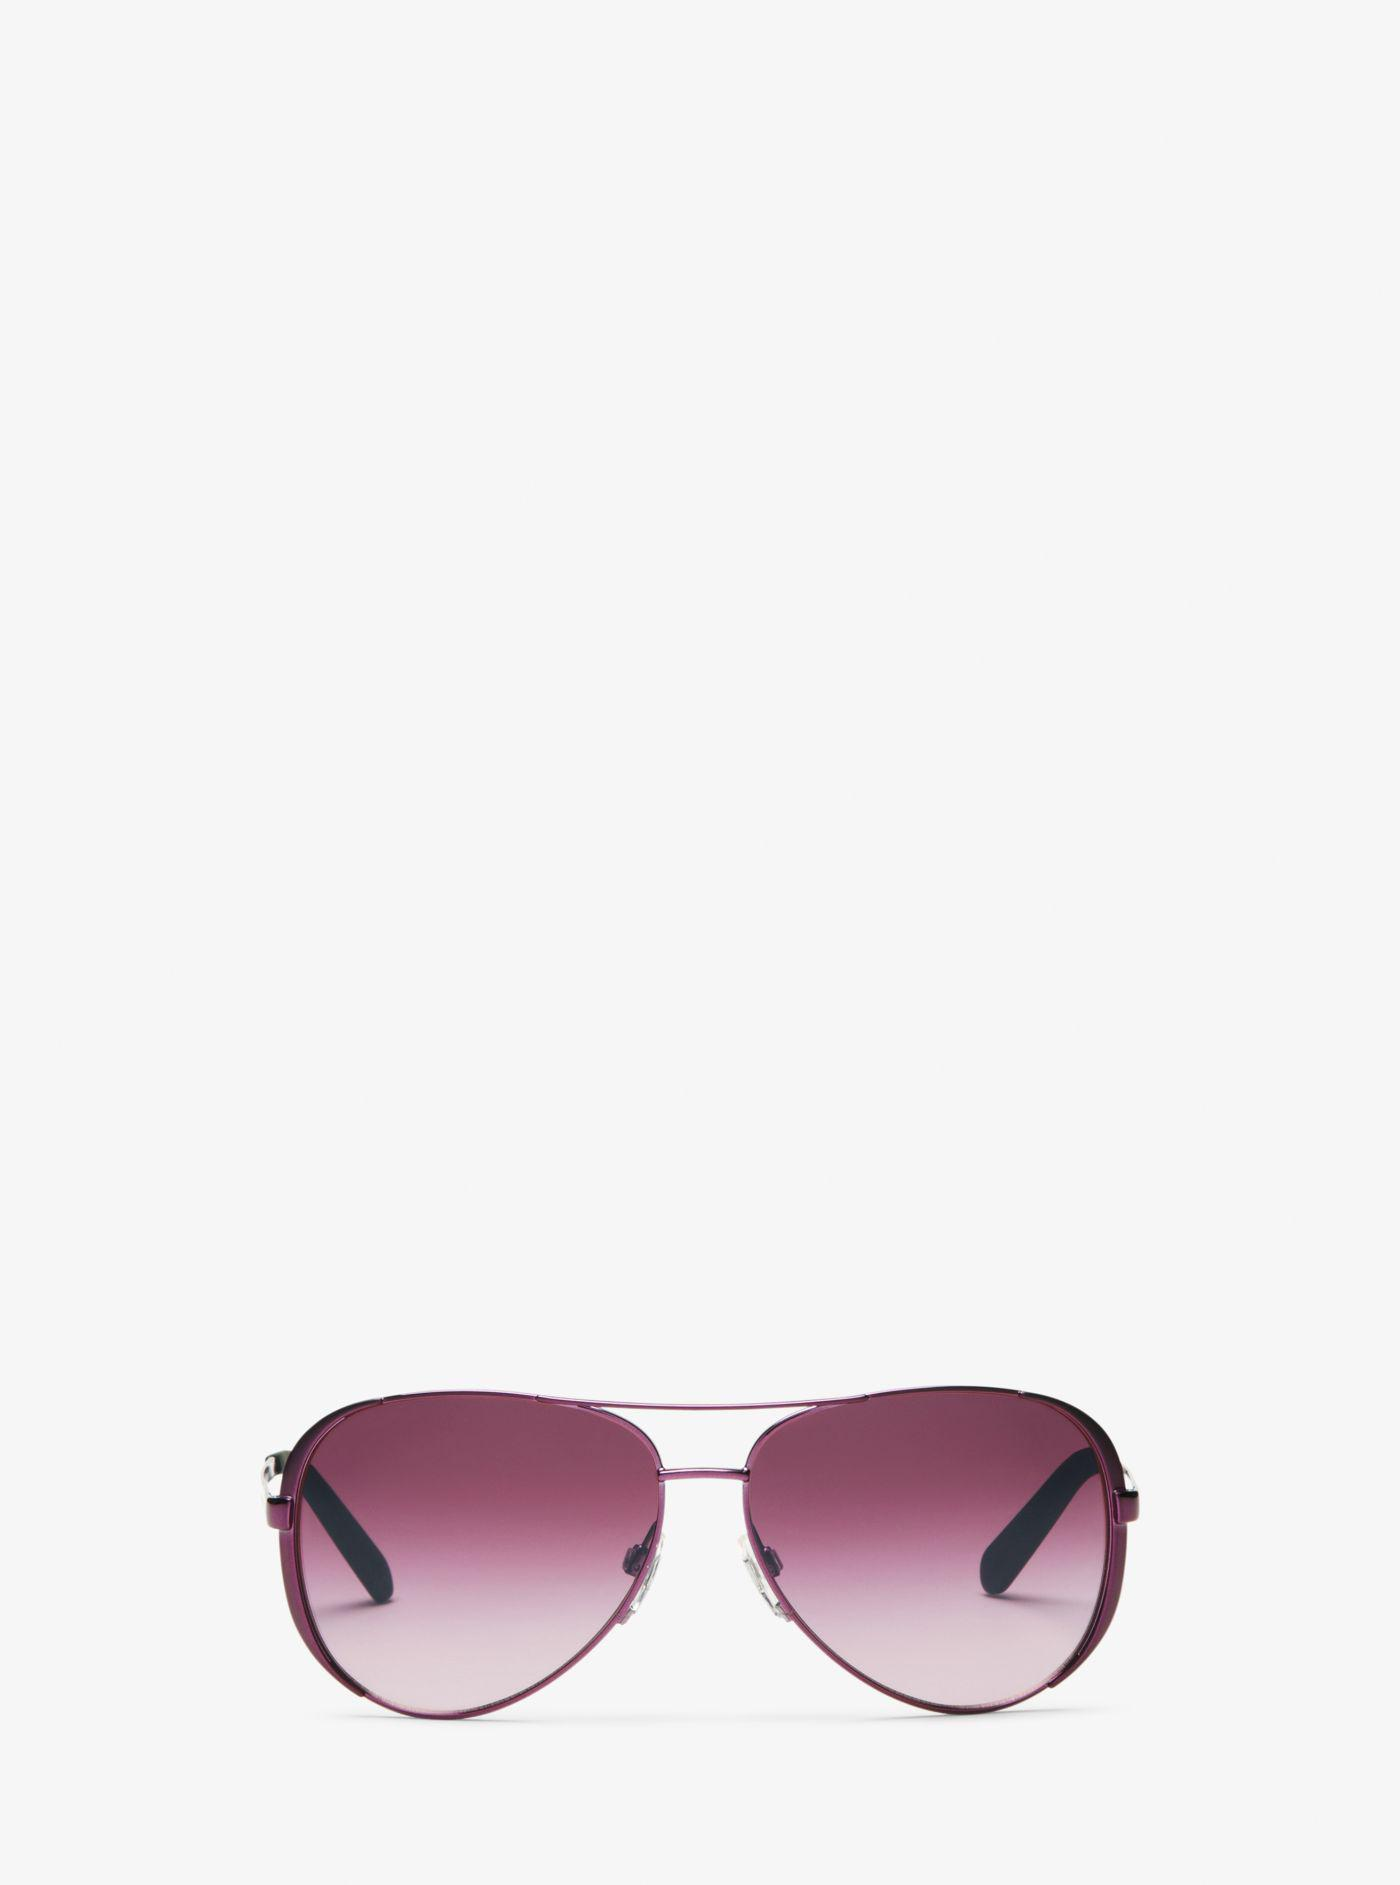 34b16d2d36 Lyst - Michael Kors Chelsea Sunglasses in Purple